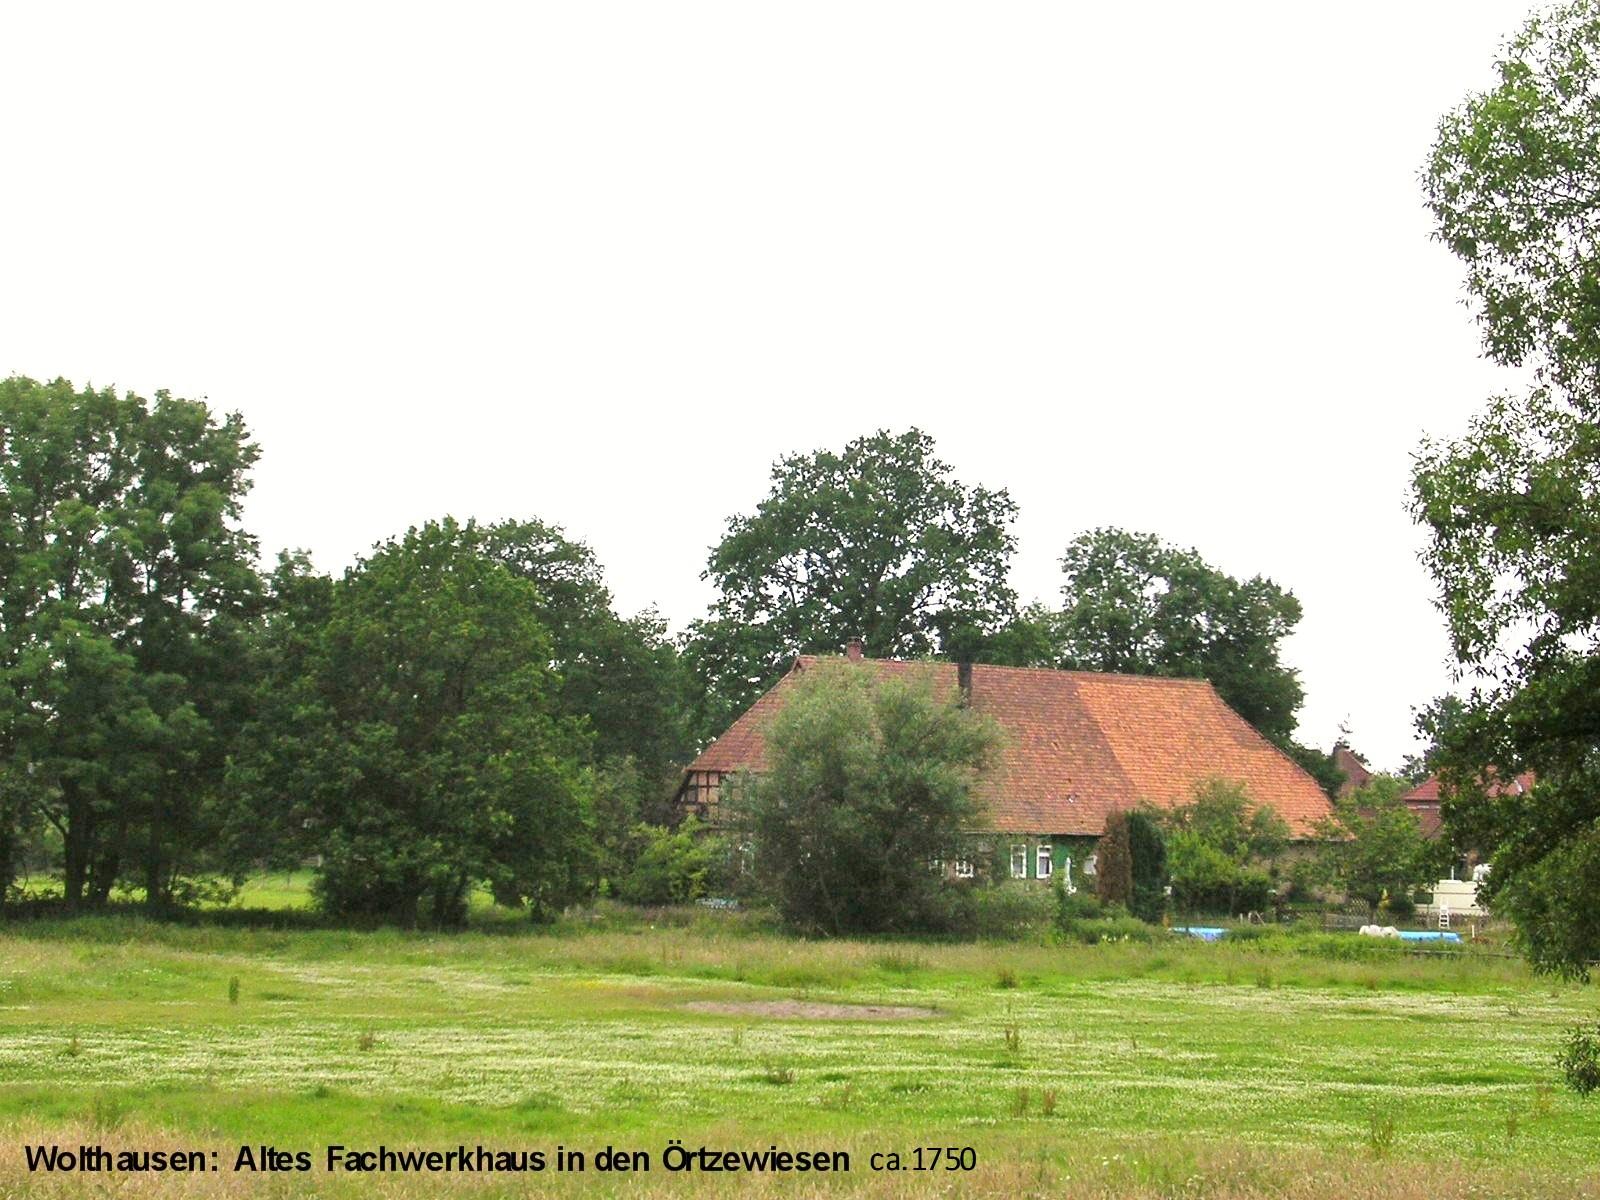 h-wolthausen-1750-haus-in-oertze-wiesen